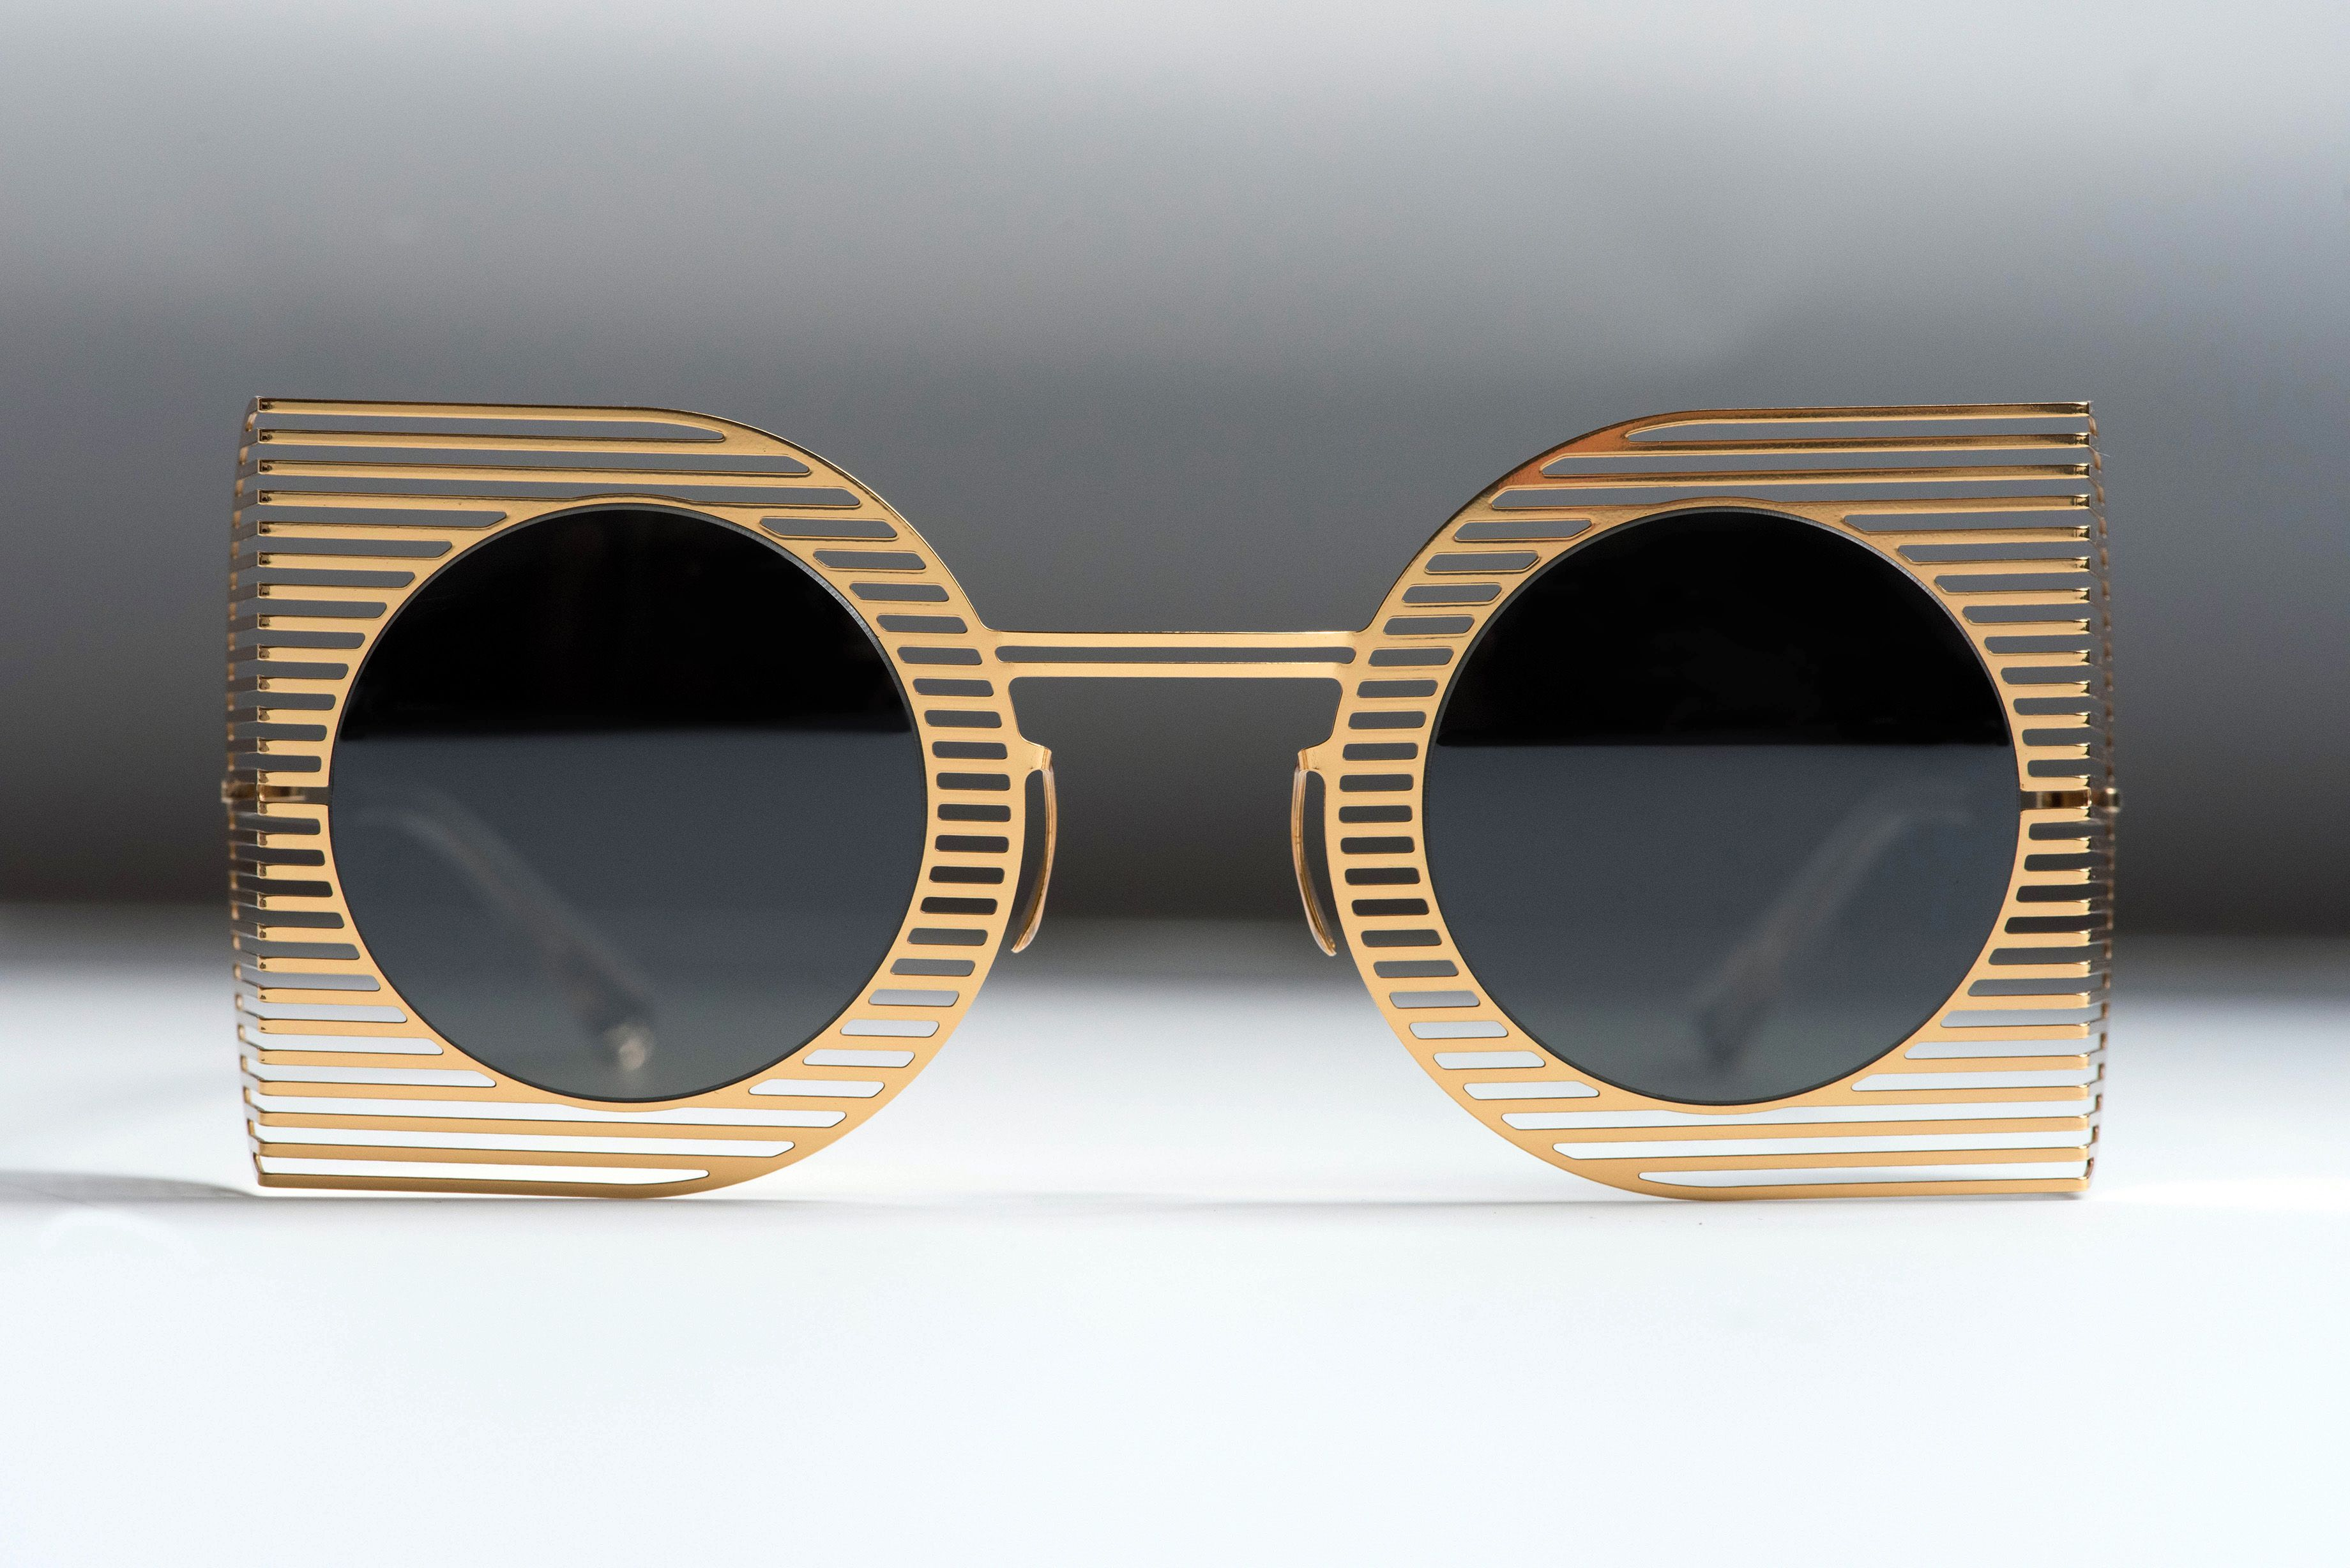 MYKITA STUDIO 1.3 | Sunglasses with a paper-thin steel frame front that casts shutter-like shadows on the face for a film noir effect. mykita.com/mykita-studio/sun-studio1-3